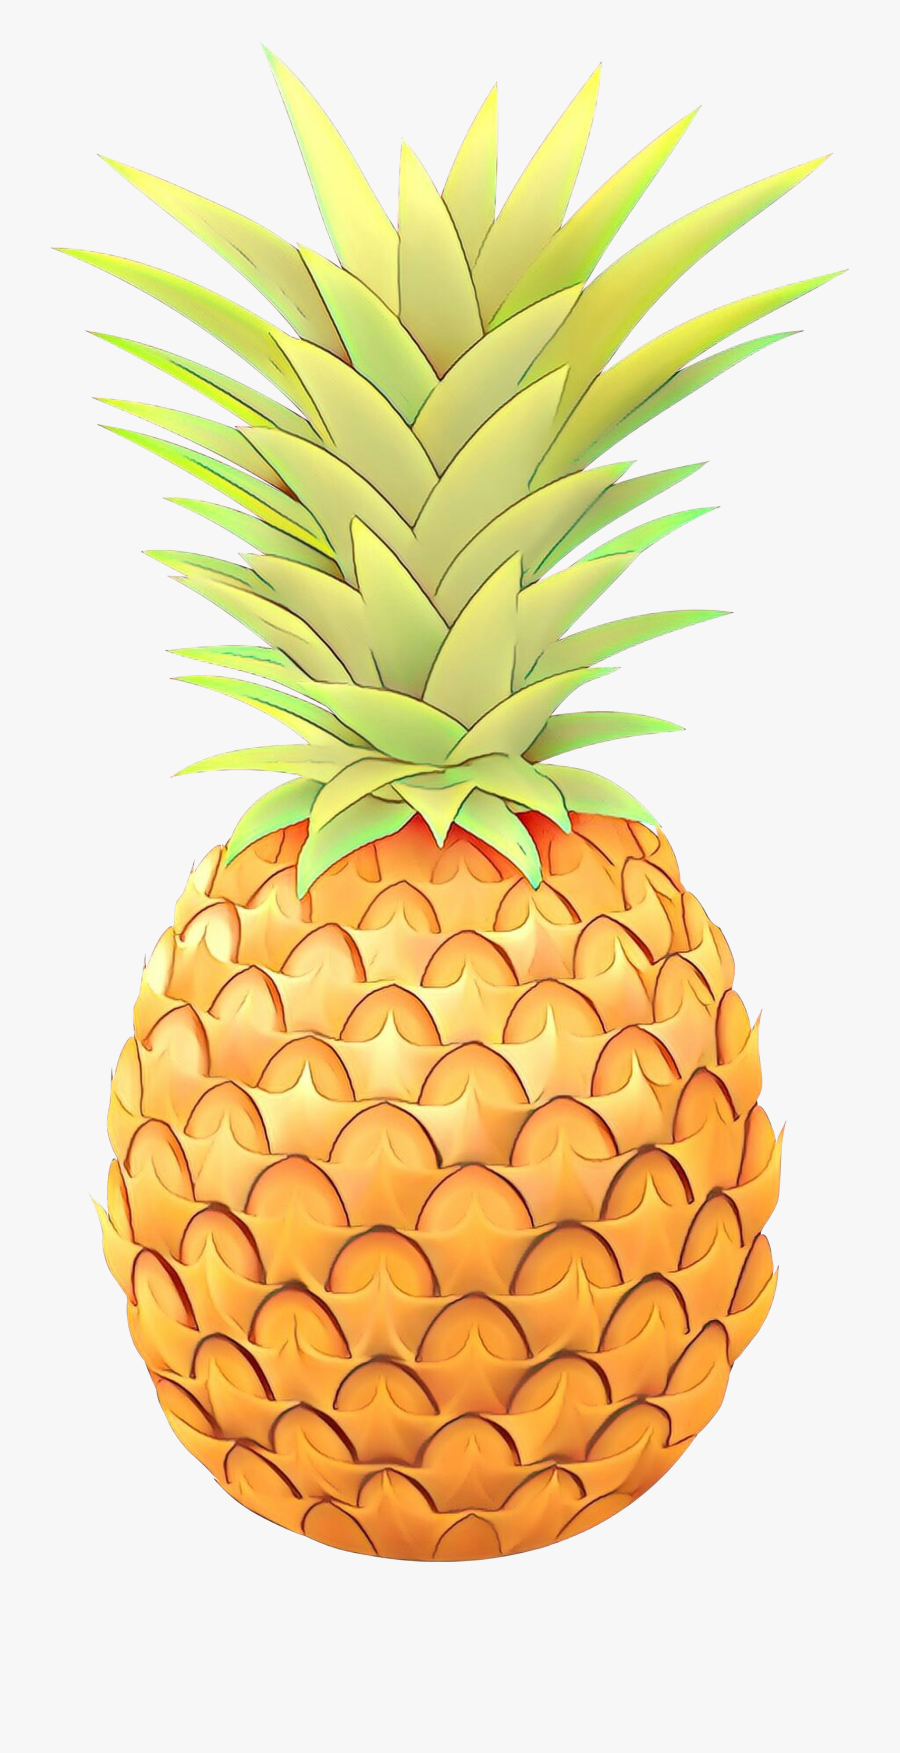 Portable Network Graphics Clip Art Pineapple Vector - Pineapple Png Clip Art, Transparent Clipart